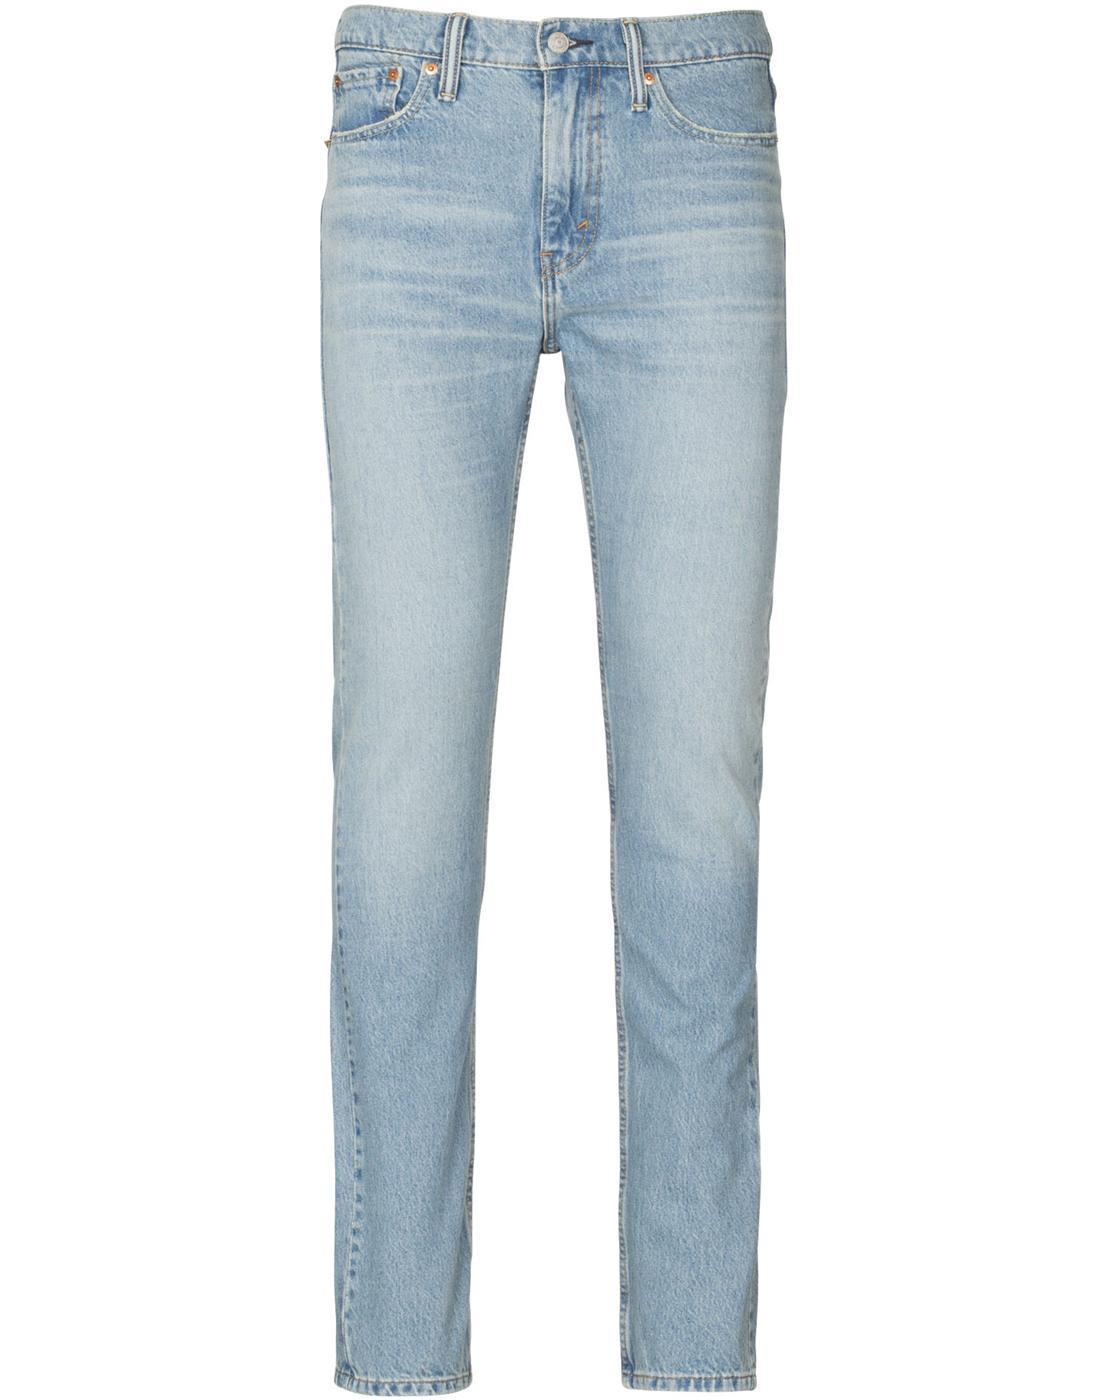 LEVI'S 510 Mod Skinny Jeans GINGHAM WARP STRETCH